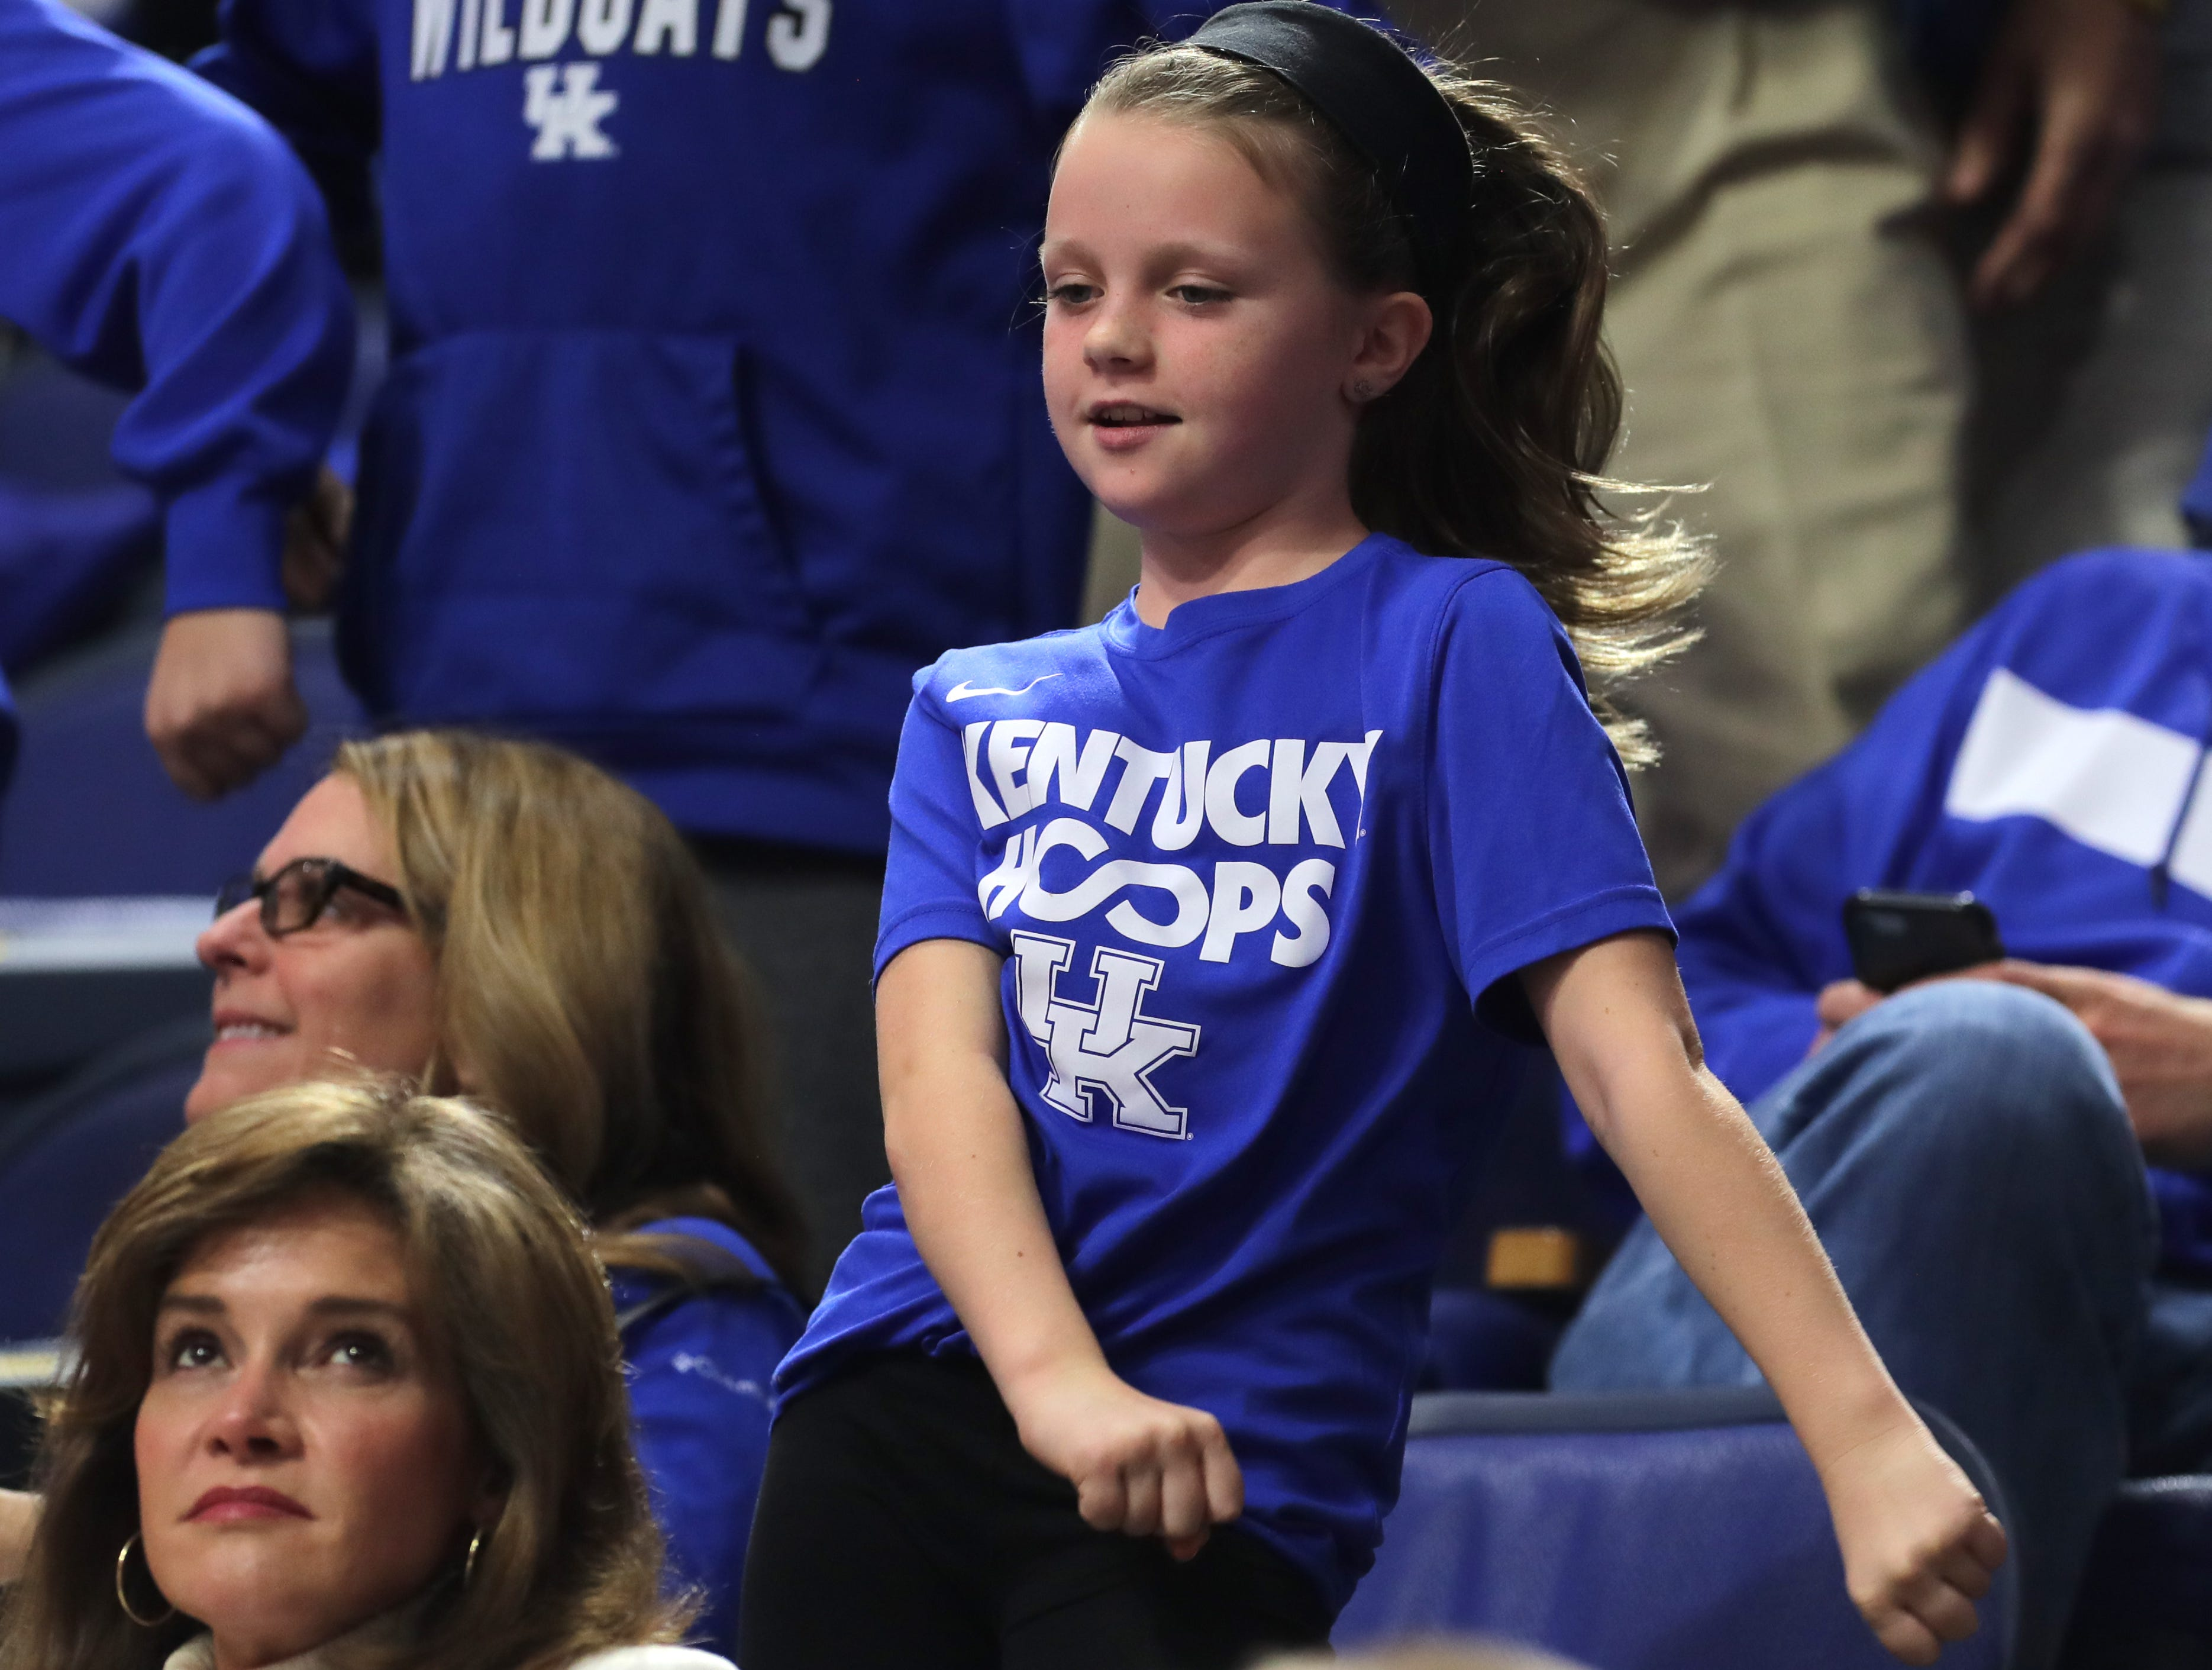 Kentucky fans dance during a timeout. Nov. 21, 2018